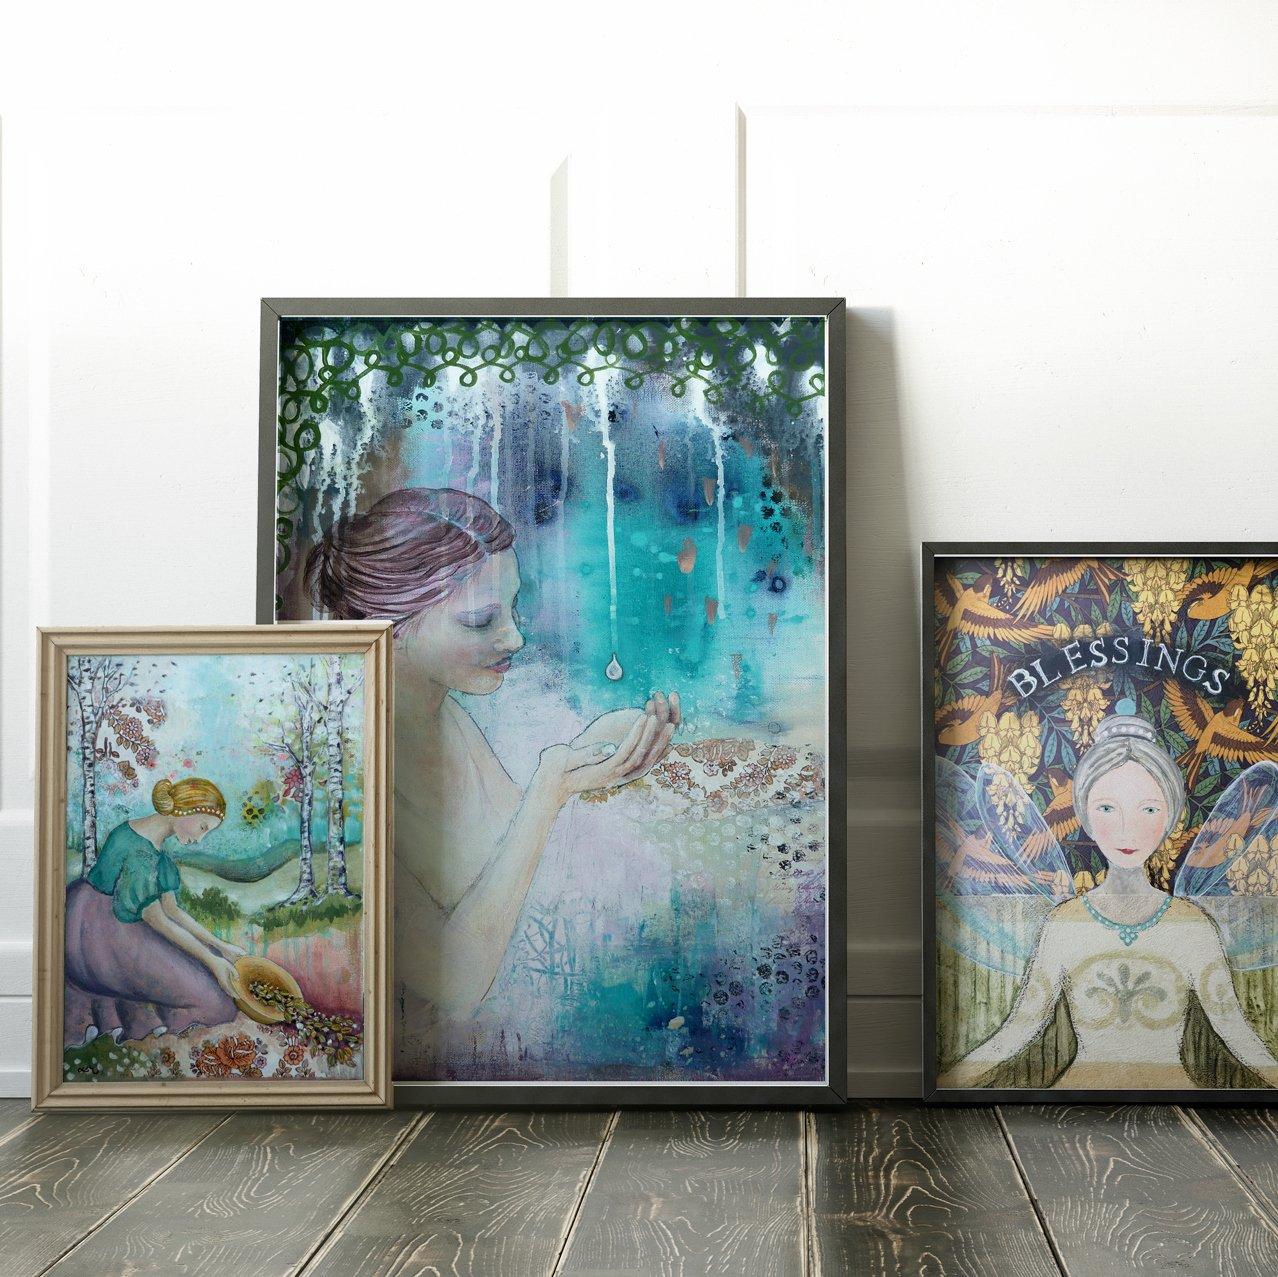 30 x 40 cm Art Print - choose any image